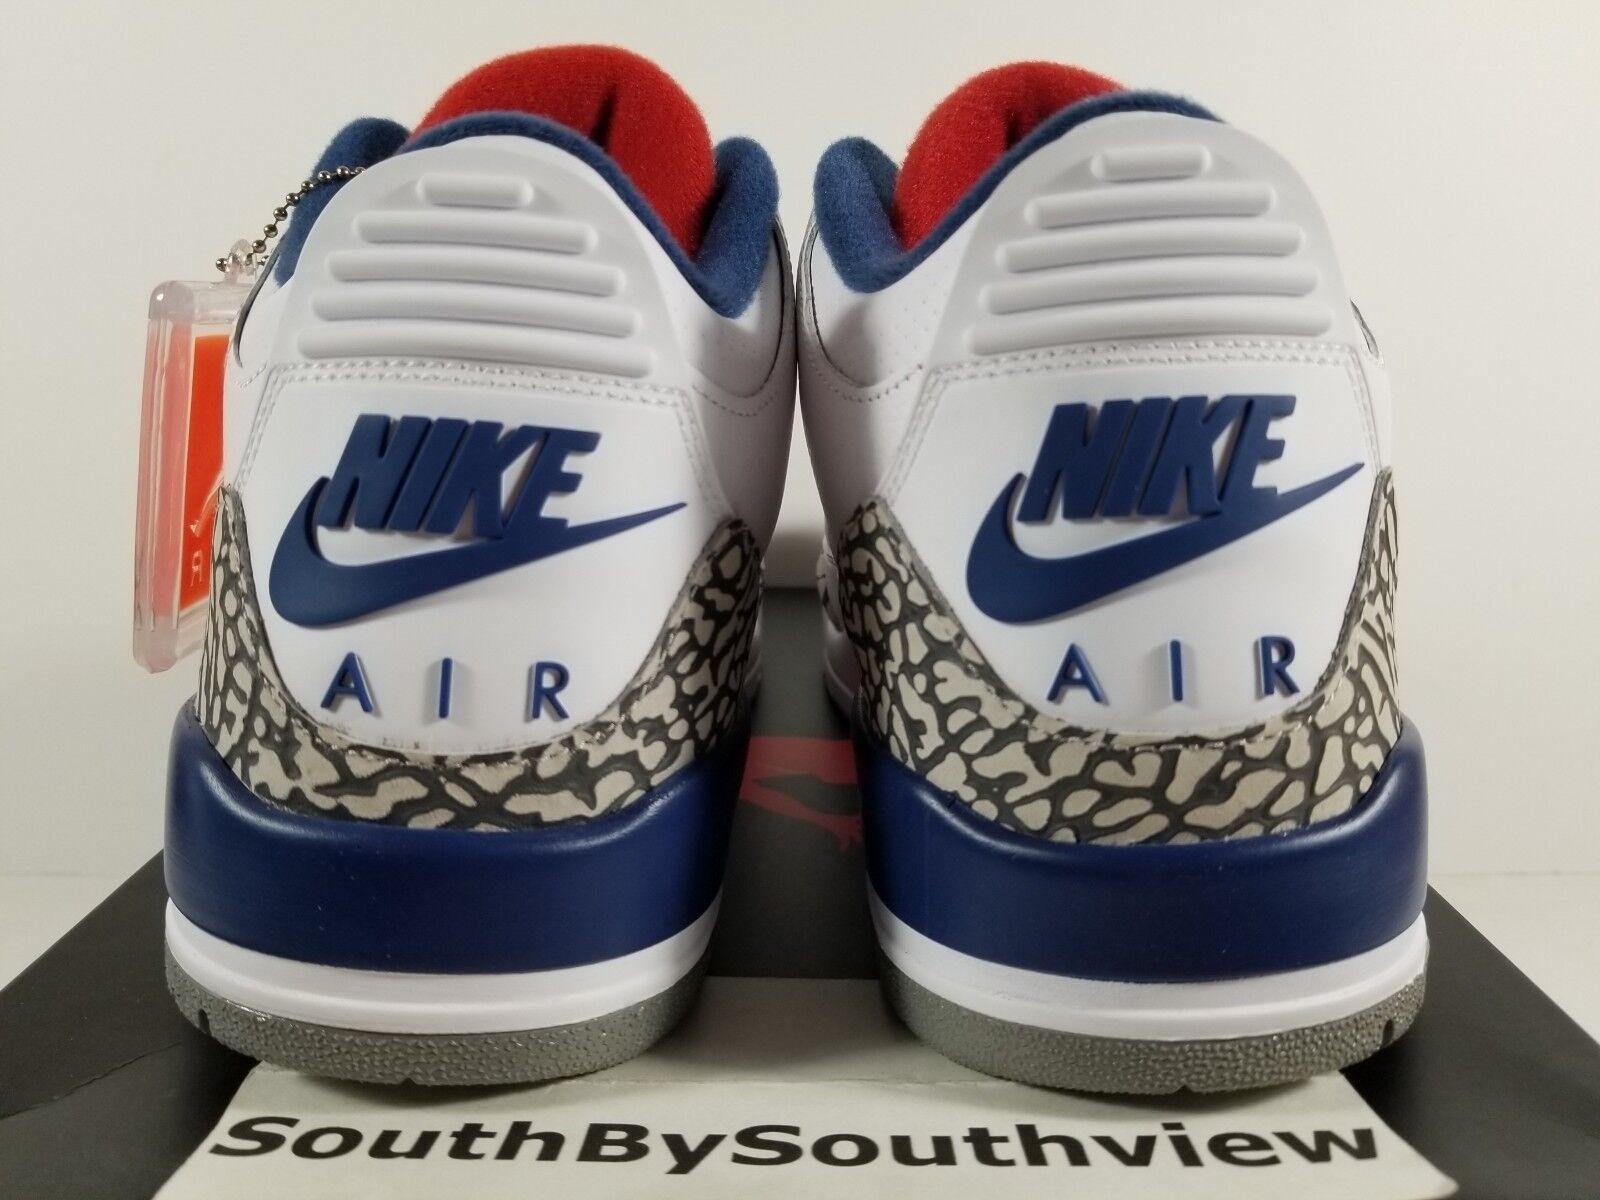 Nike Air Jordan 3 True Blue OG NikeAir 2016 With Receipt III Retro 854262-106 DS